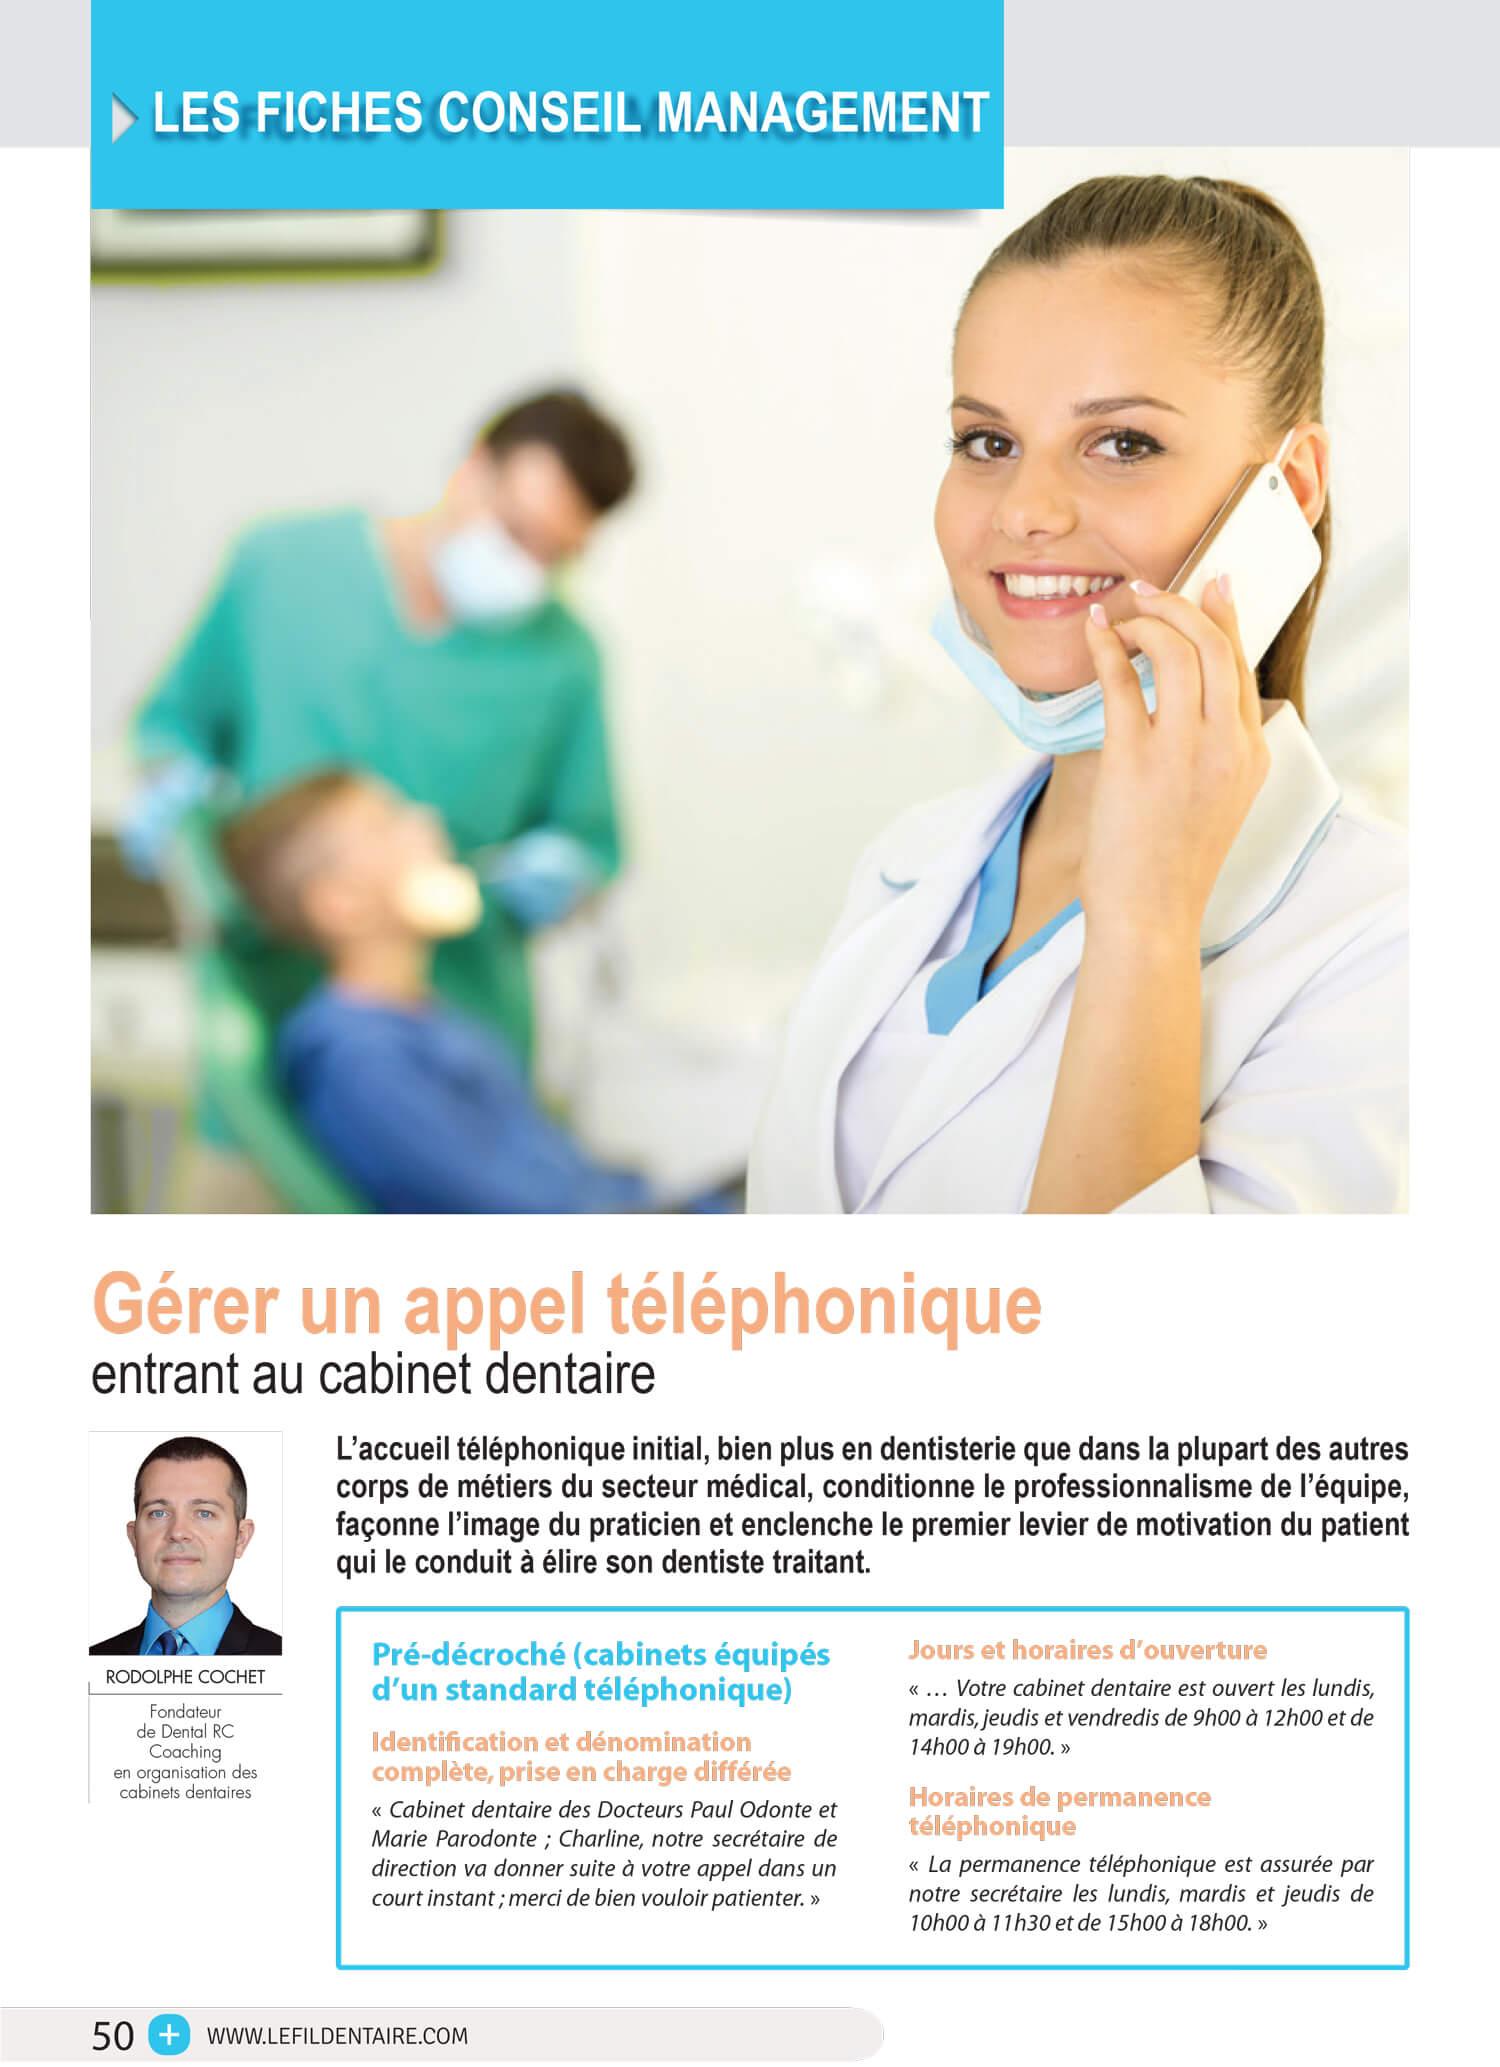 gerer-appel-telephonique-gestion-agenda-cabinet-dentaire-rodolphe-cochet.jpg